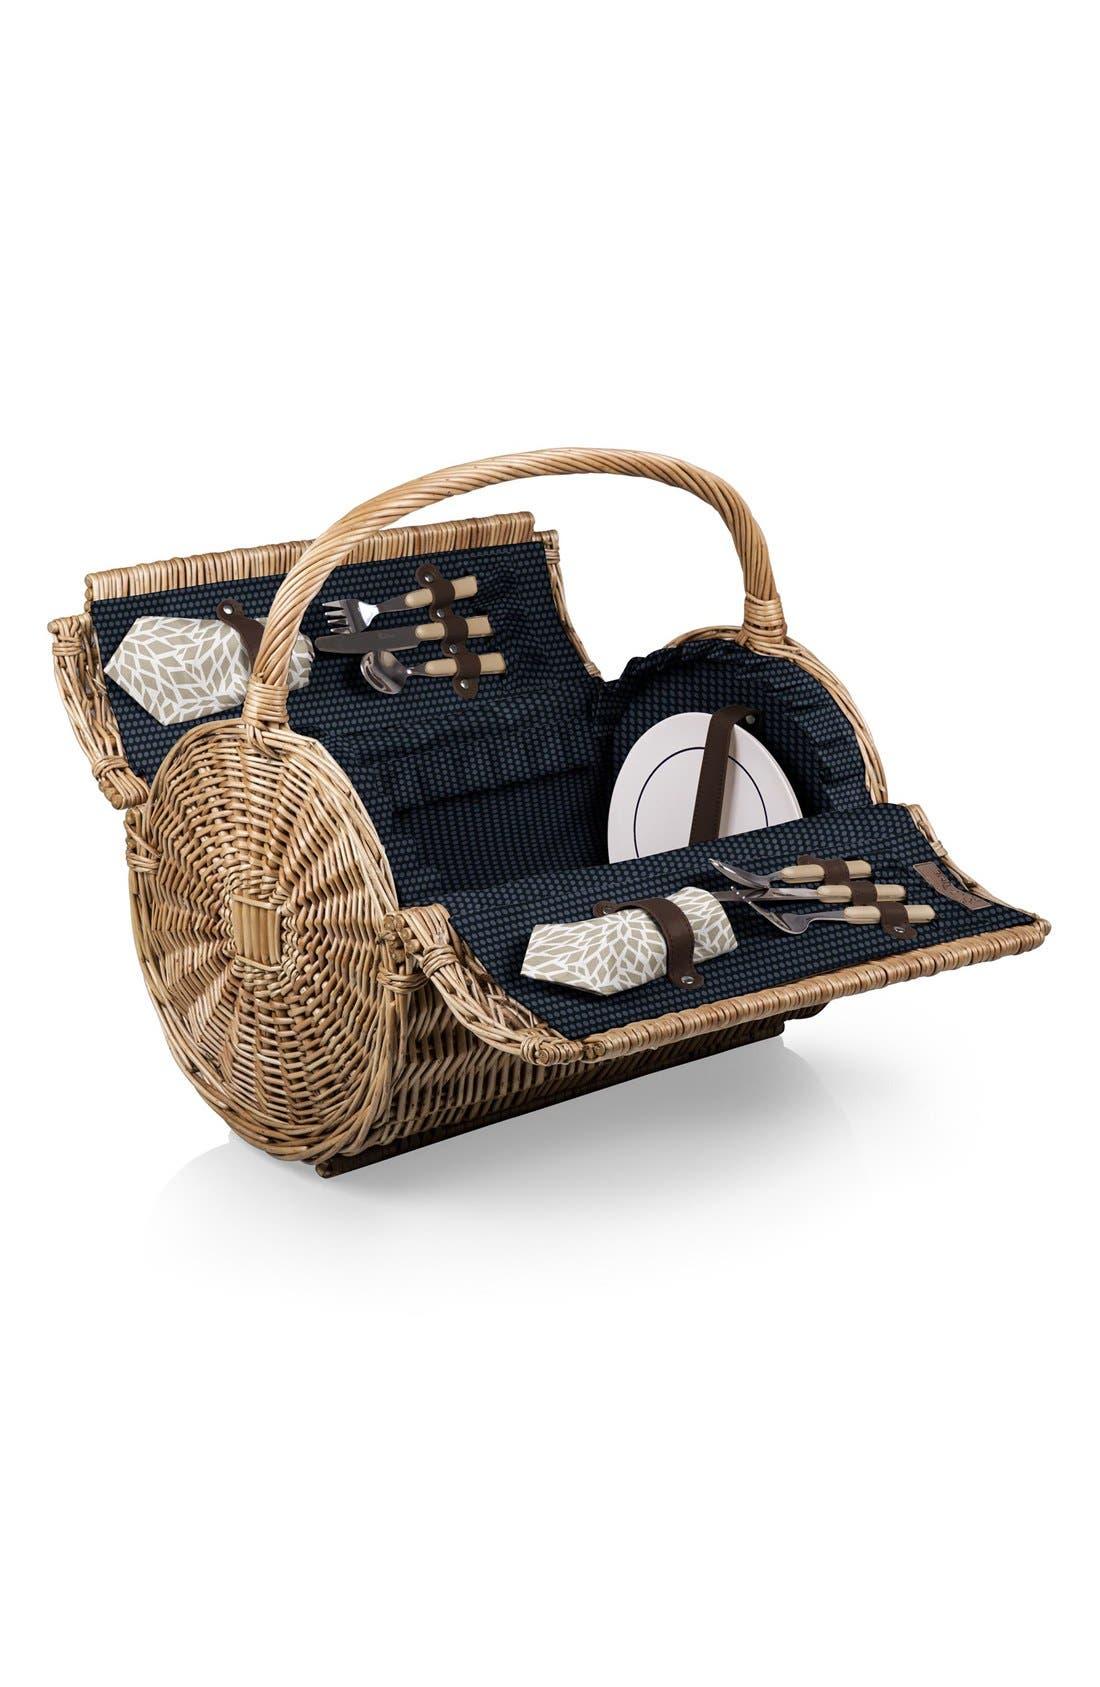 Picnic Time Wicker Barrel Picnic Basket